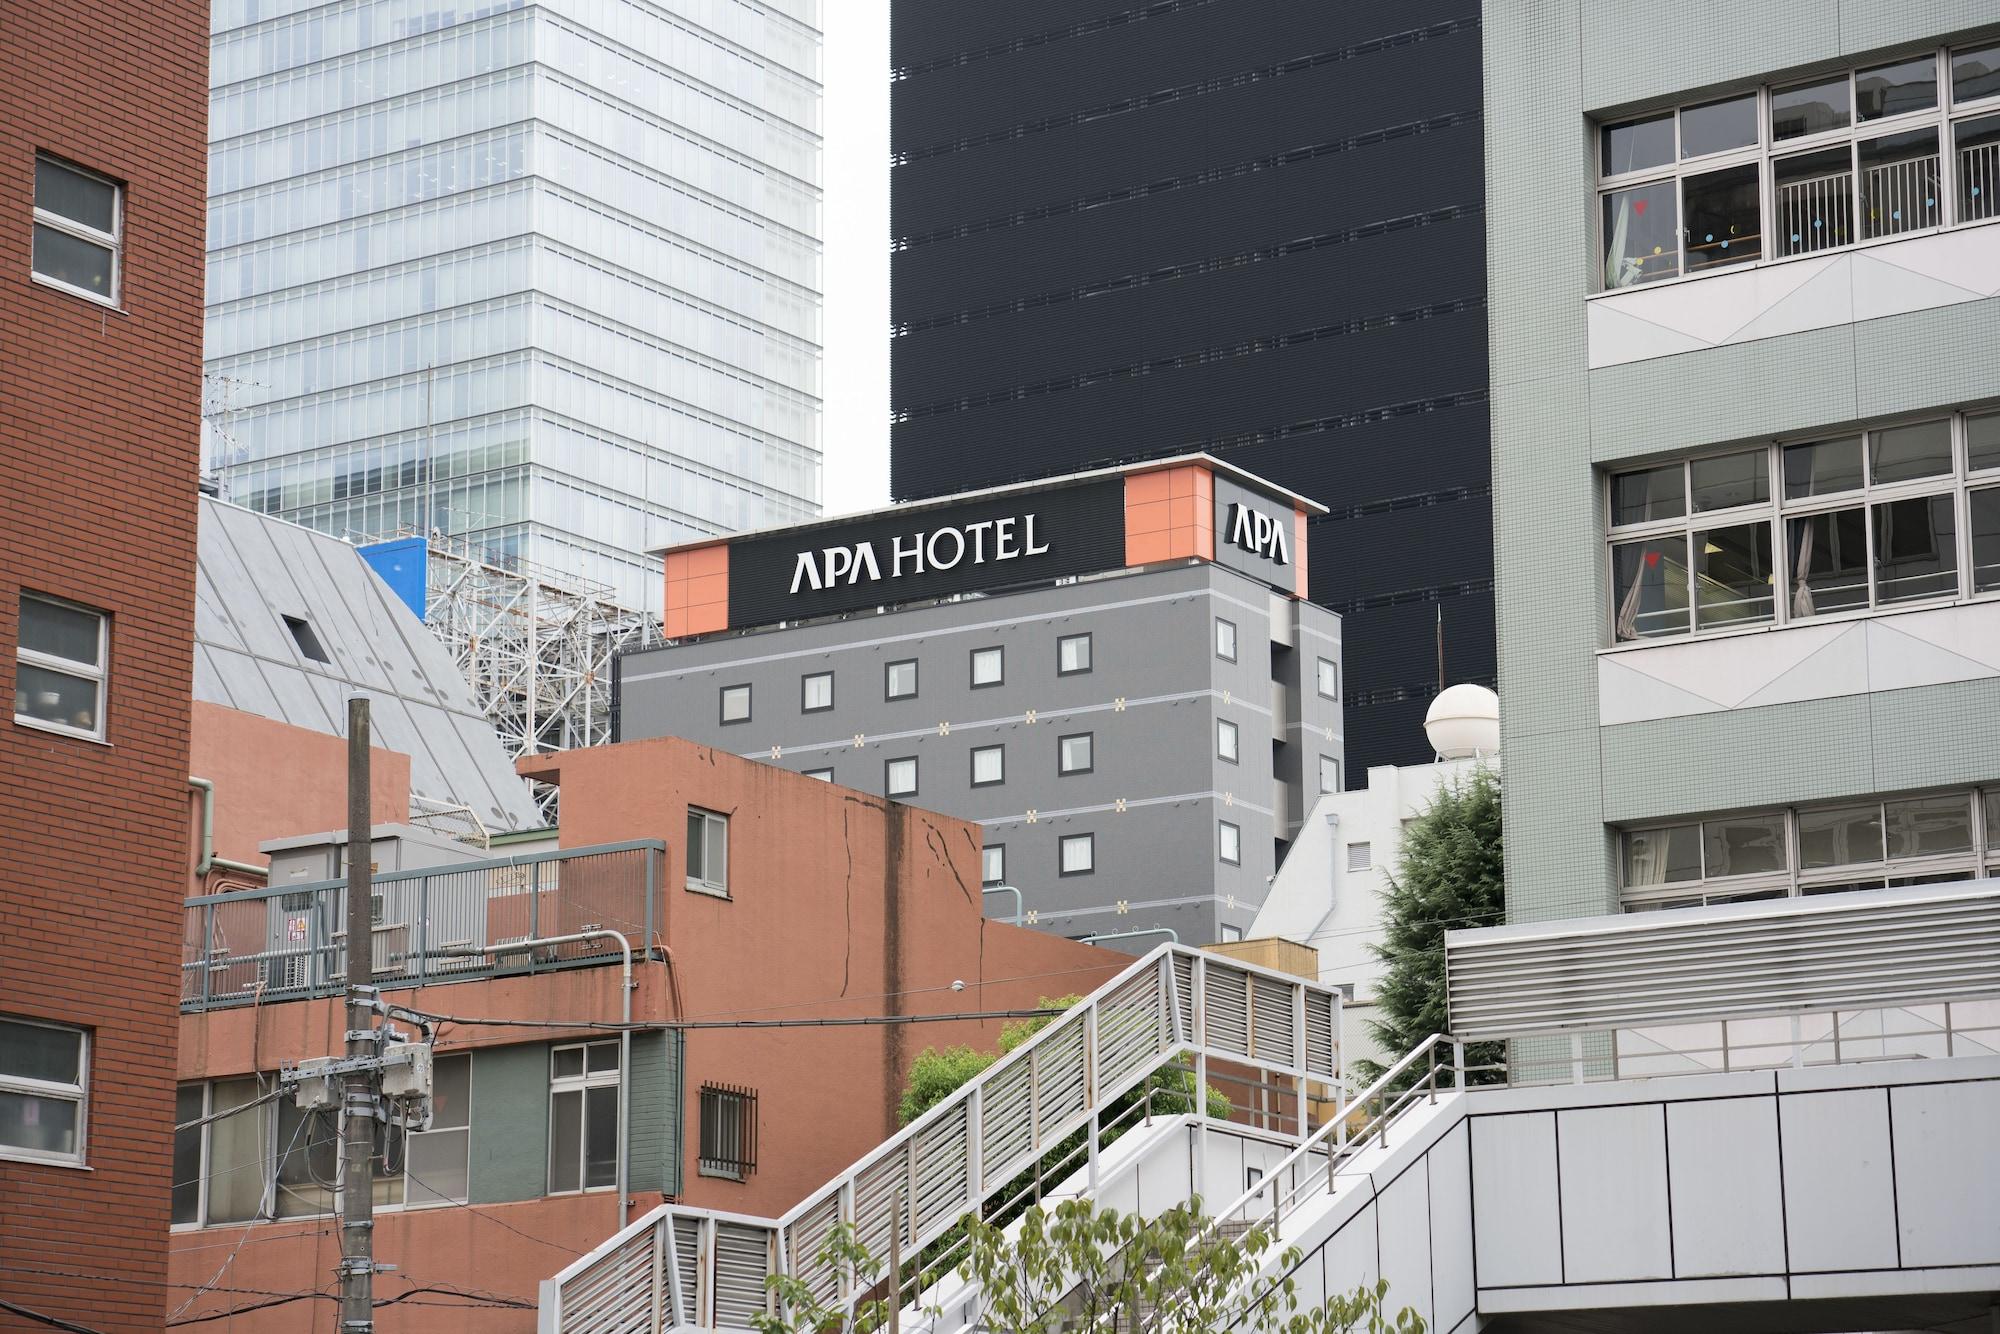 APA Hotel Akihabaraeki Denkigaiguchi, Bunkyō